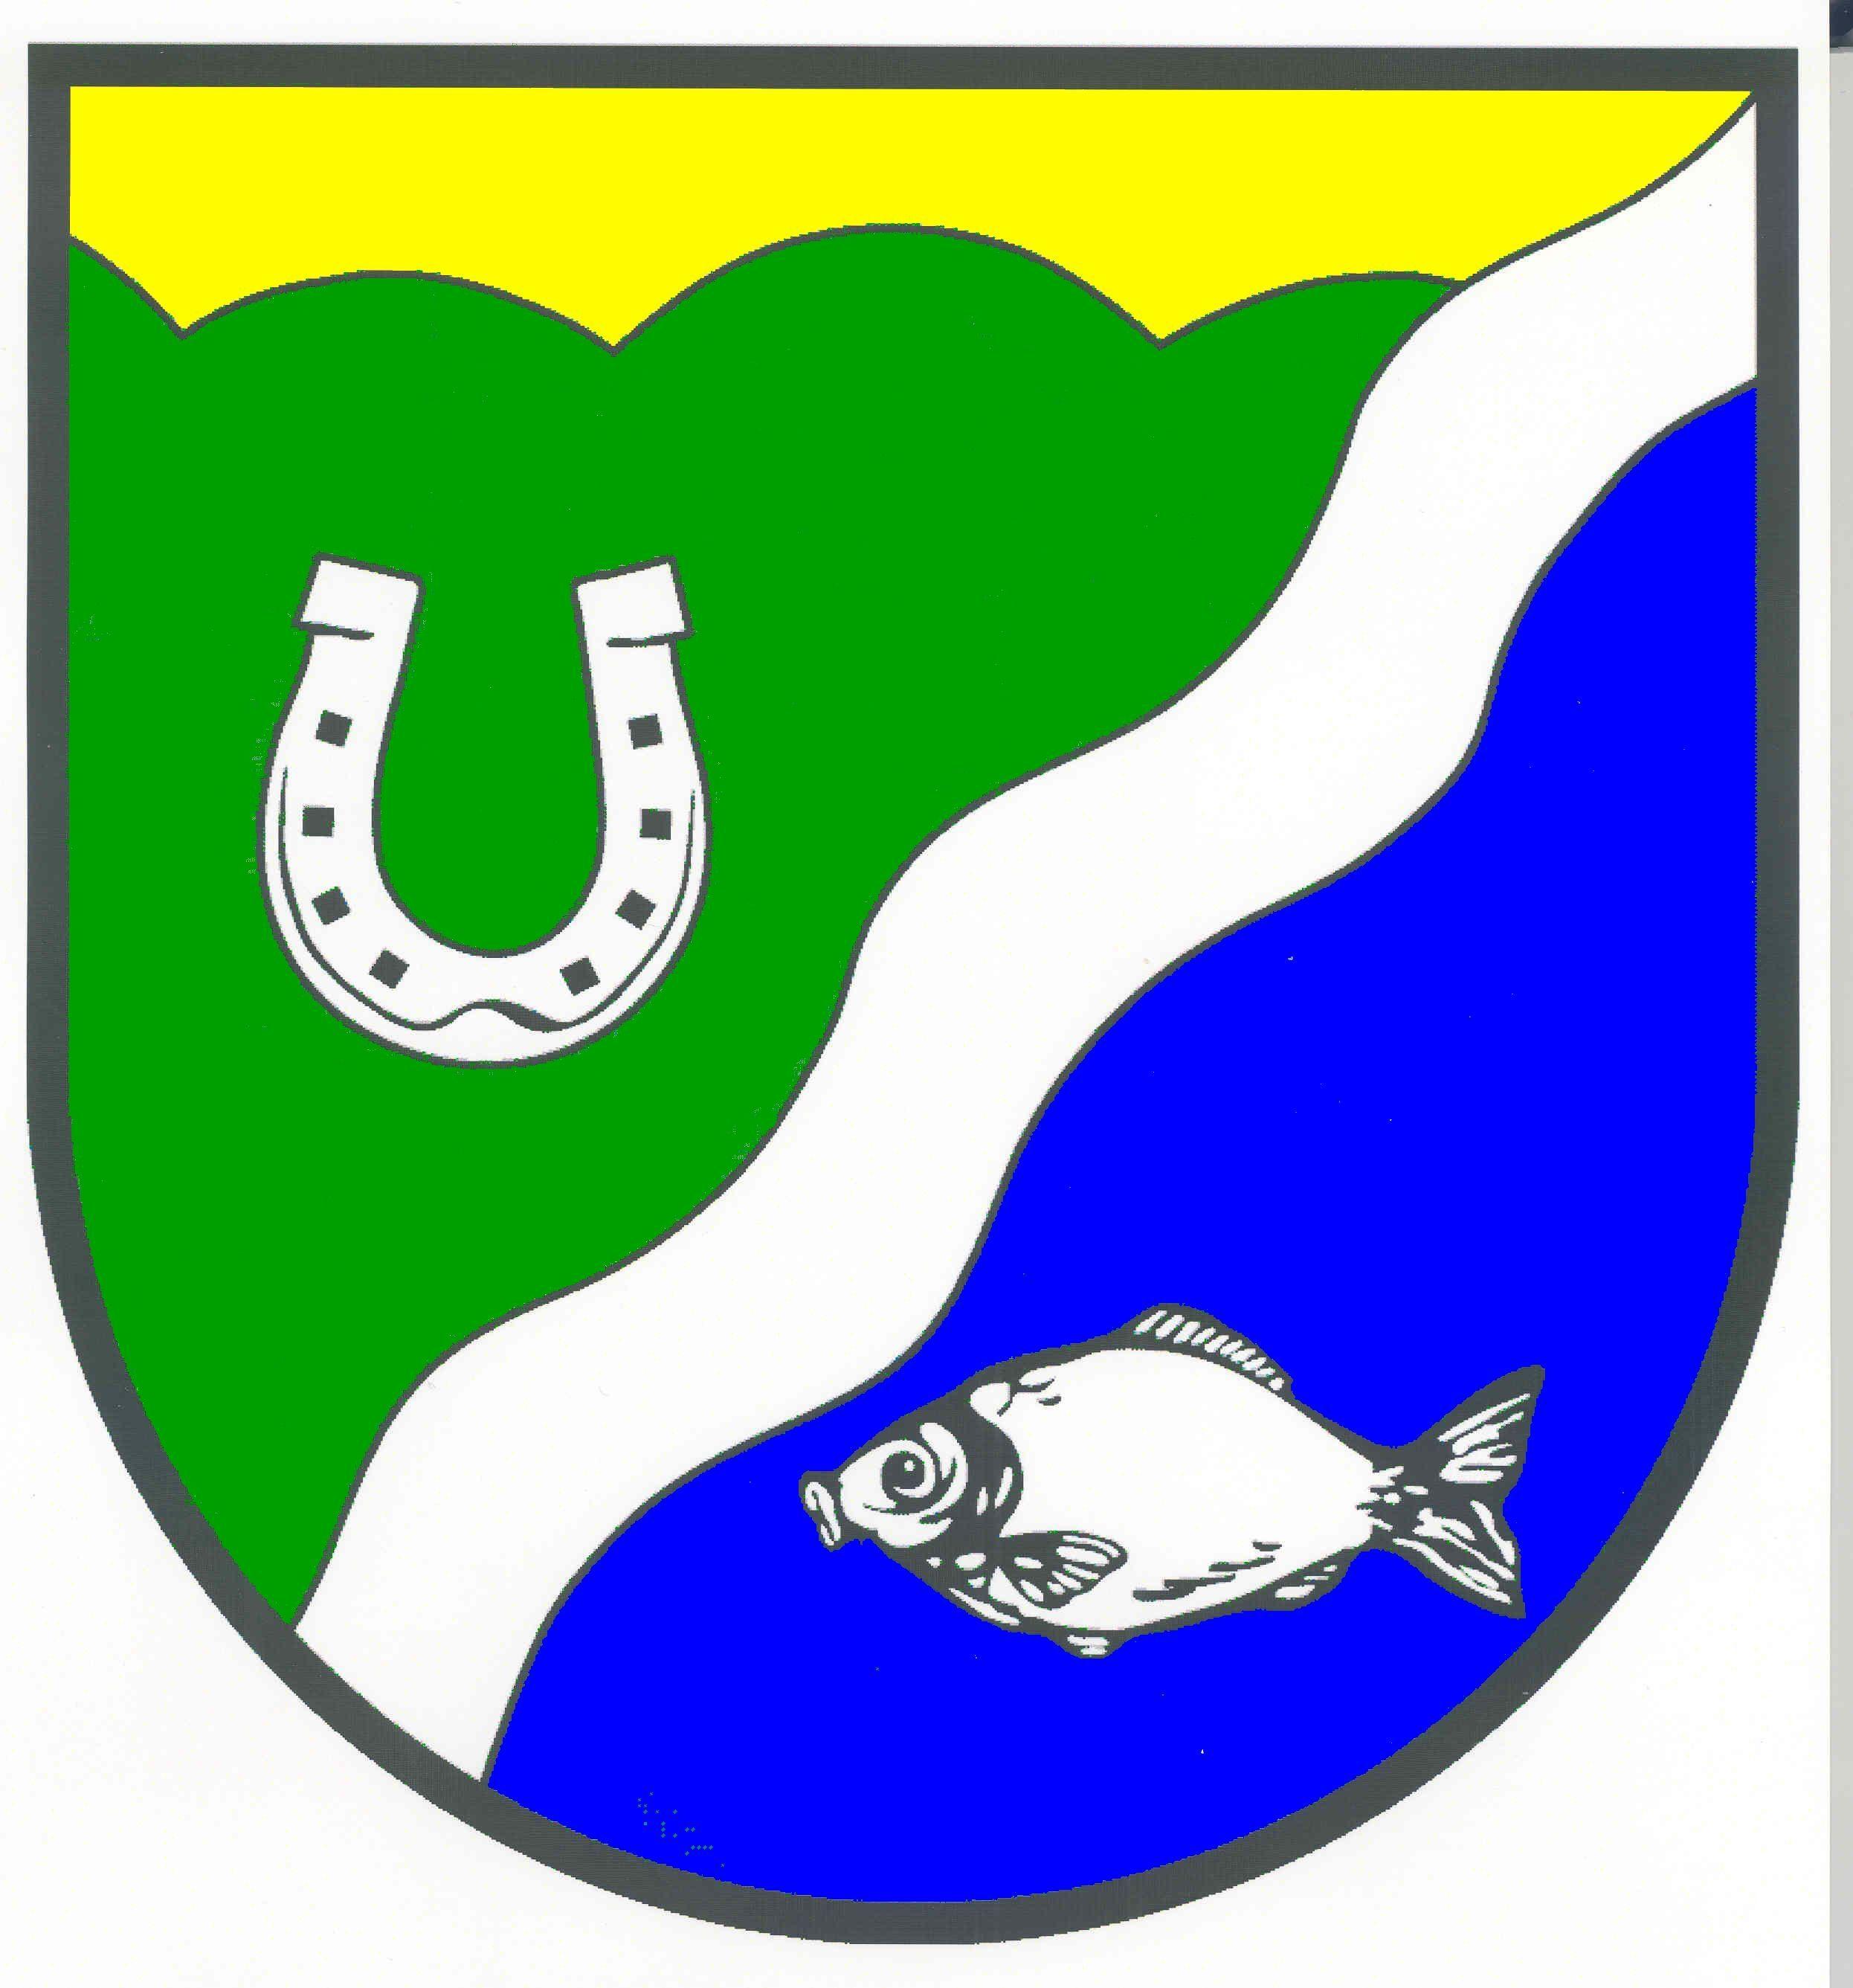 Wappen GemeindeHeilshoop, Kreis Stormarn